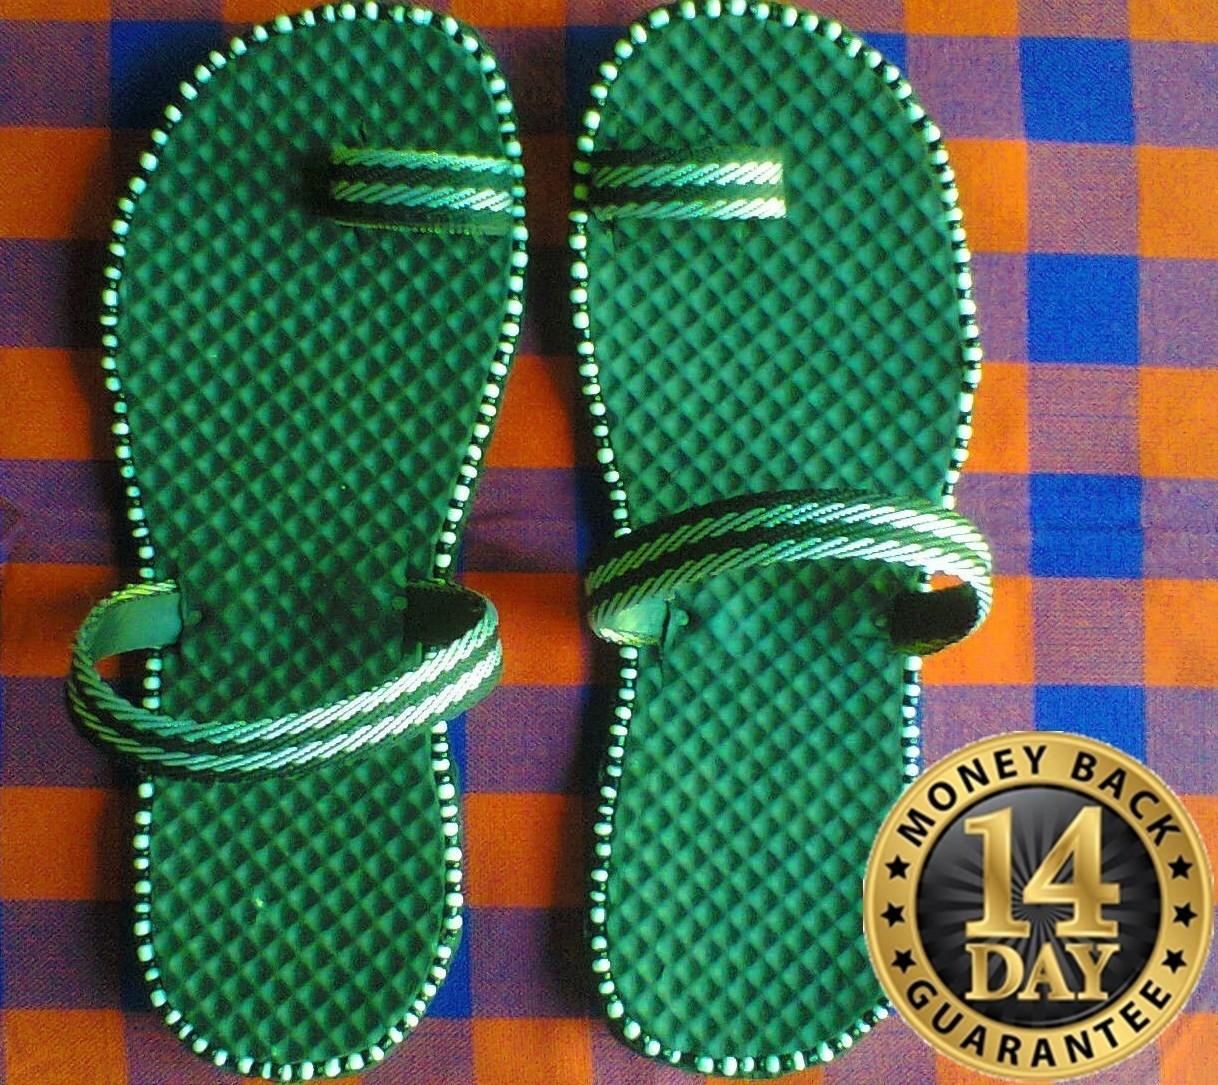 Authentic Kenya beaded Masai sandals flip flops-U.S size 11.0 UNISEX